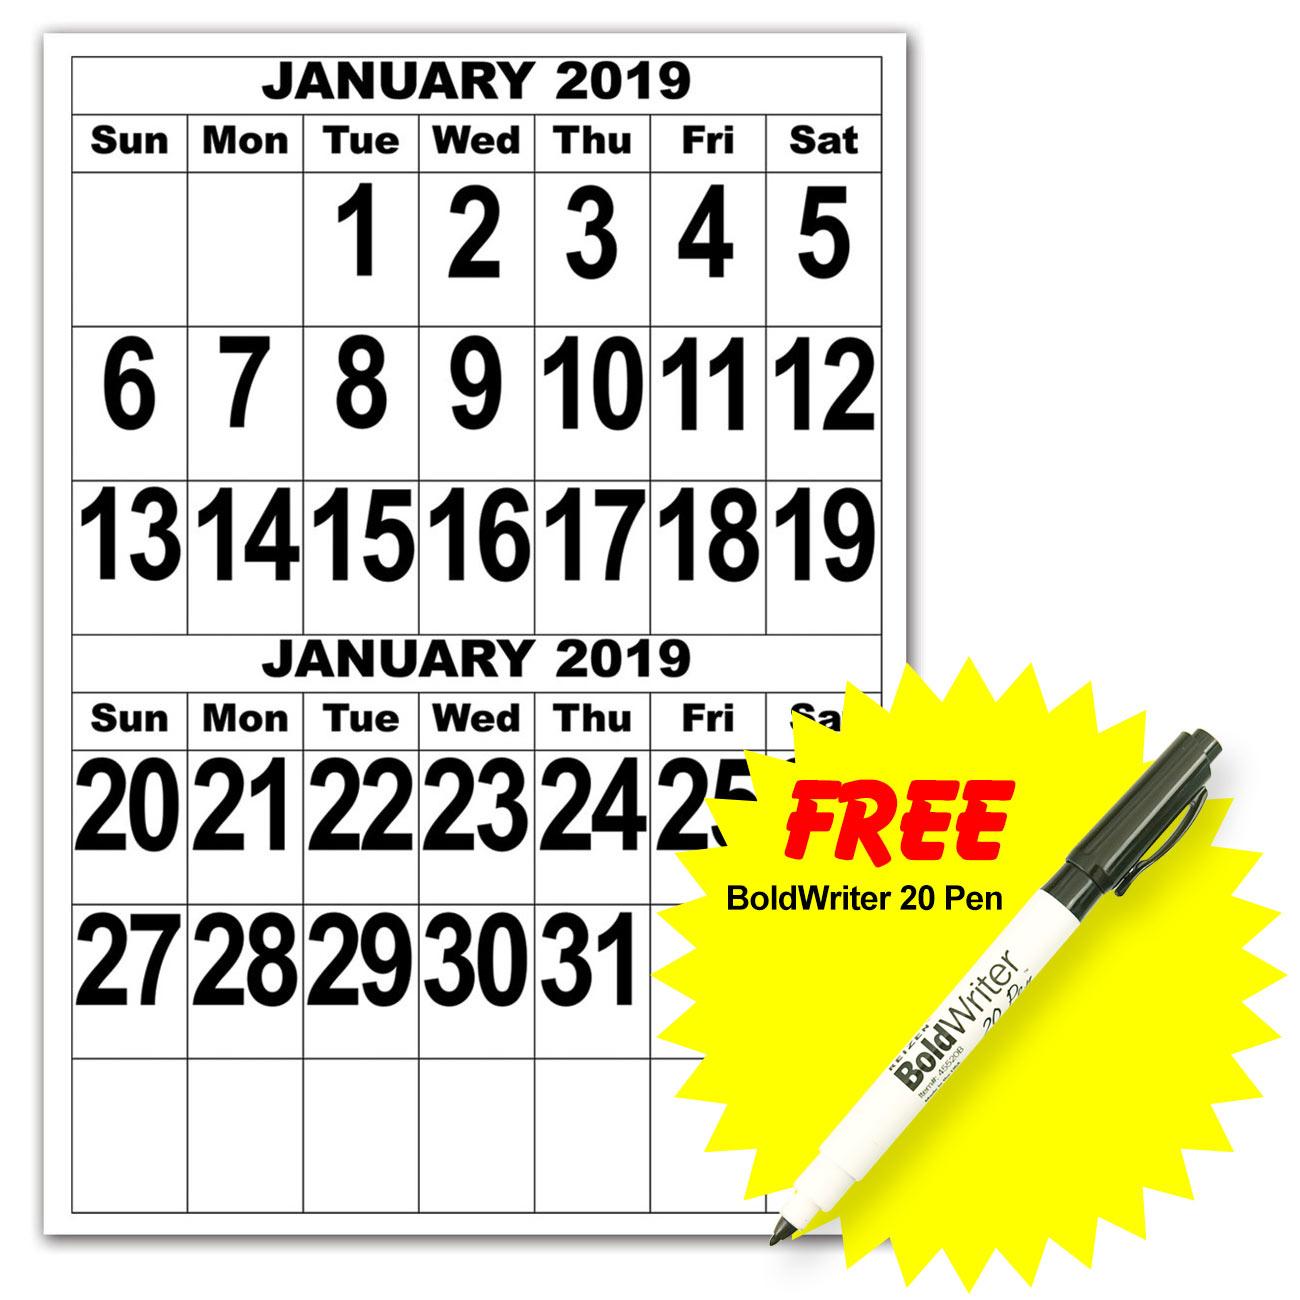 Giant Print Calendar - 2019 with BoldWriter 20 Pen